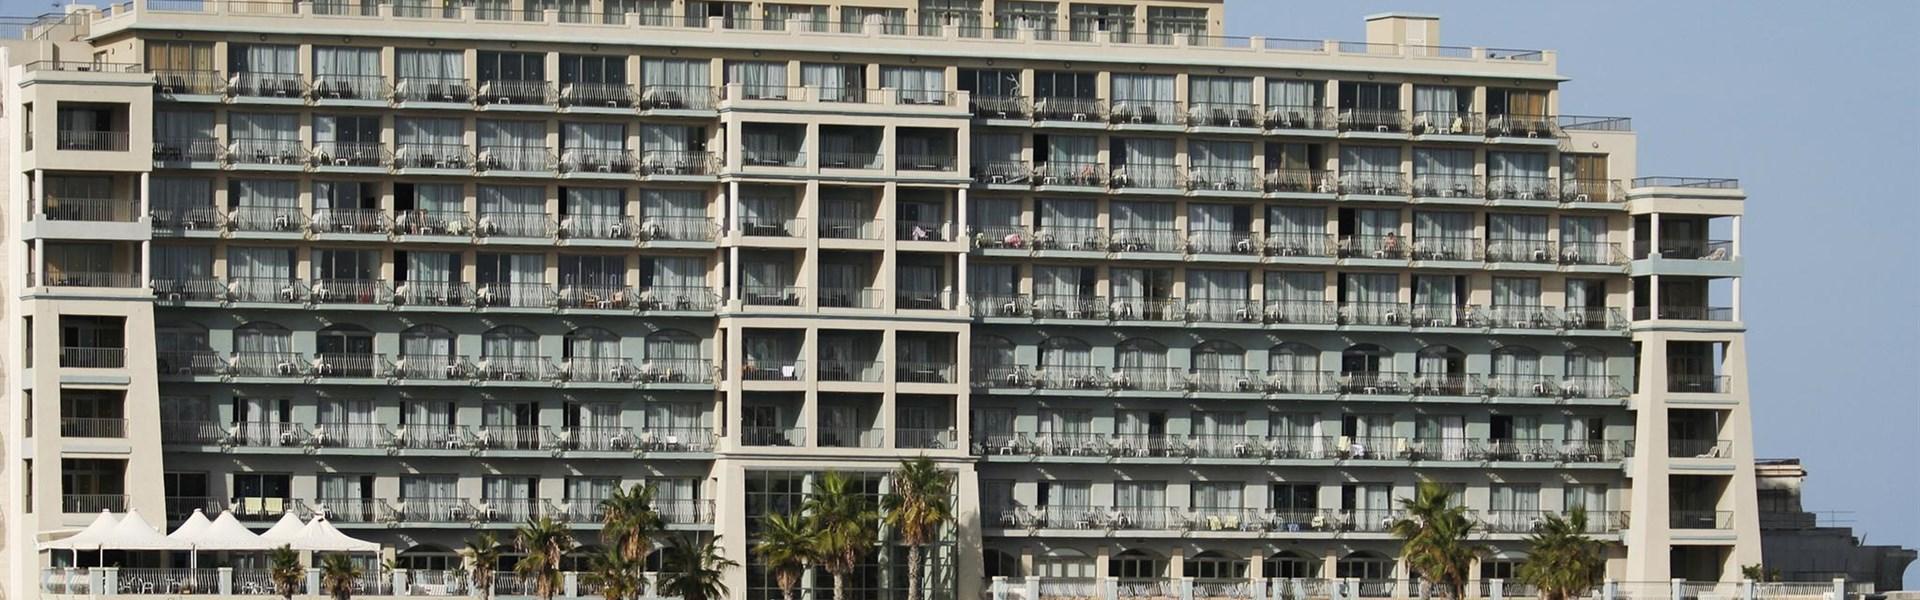 Marco Polo - Cavalieri Art hotel -